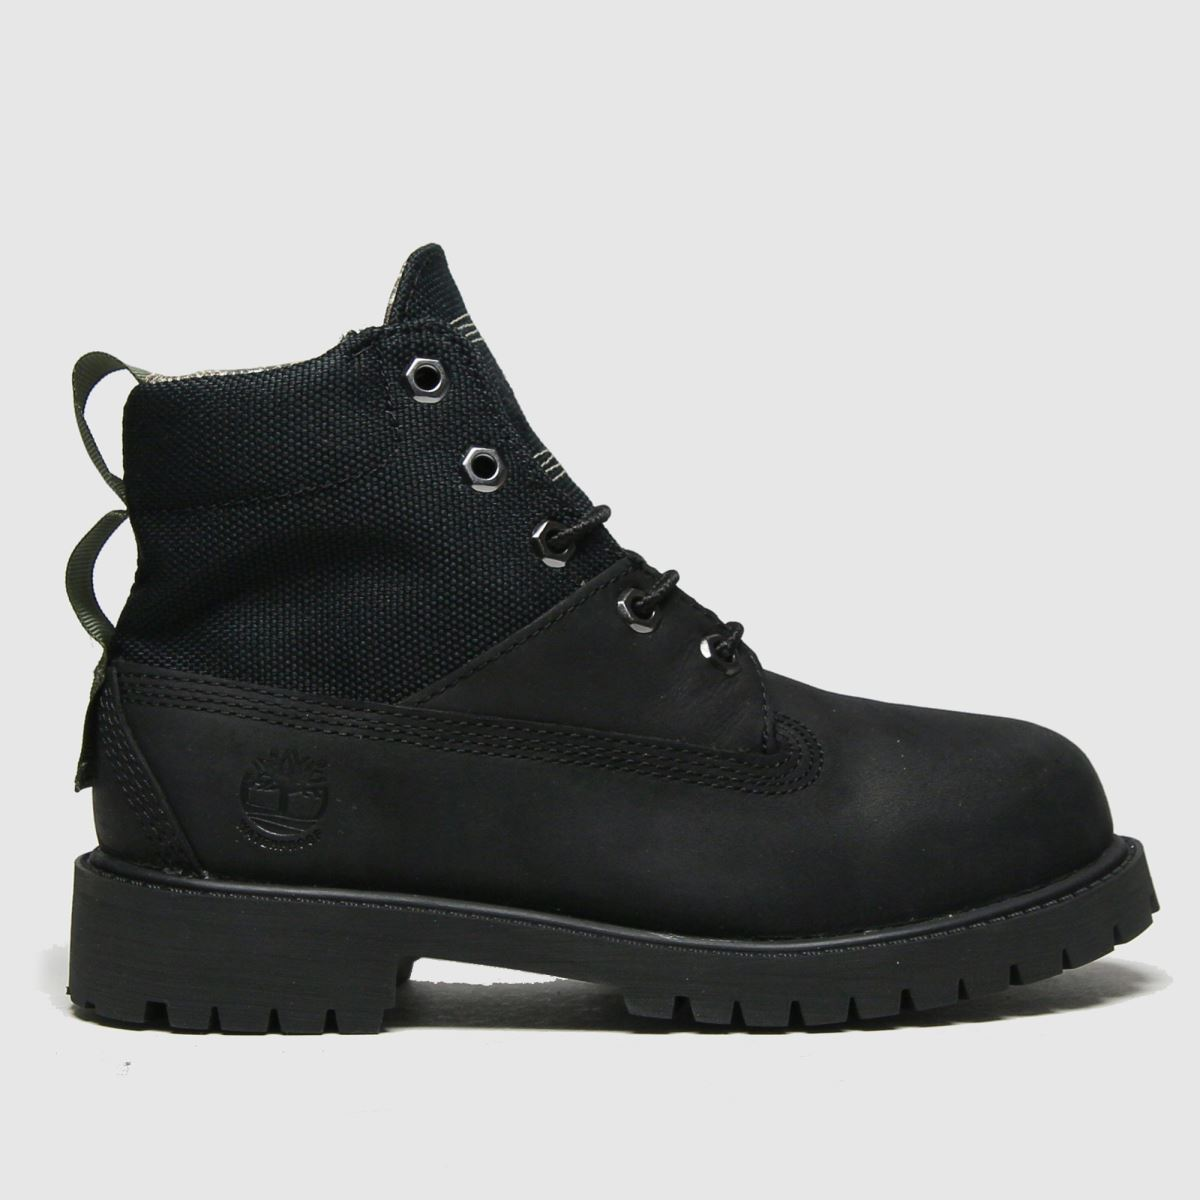 Timberland Black Rebotl 6in Premium Boots Junior